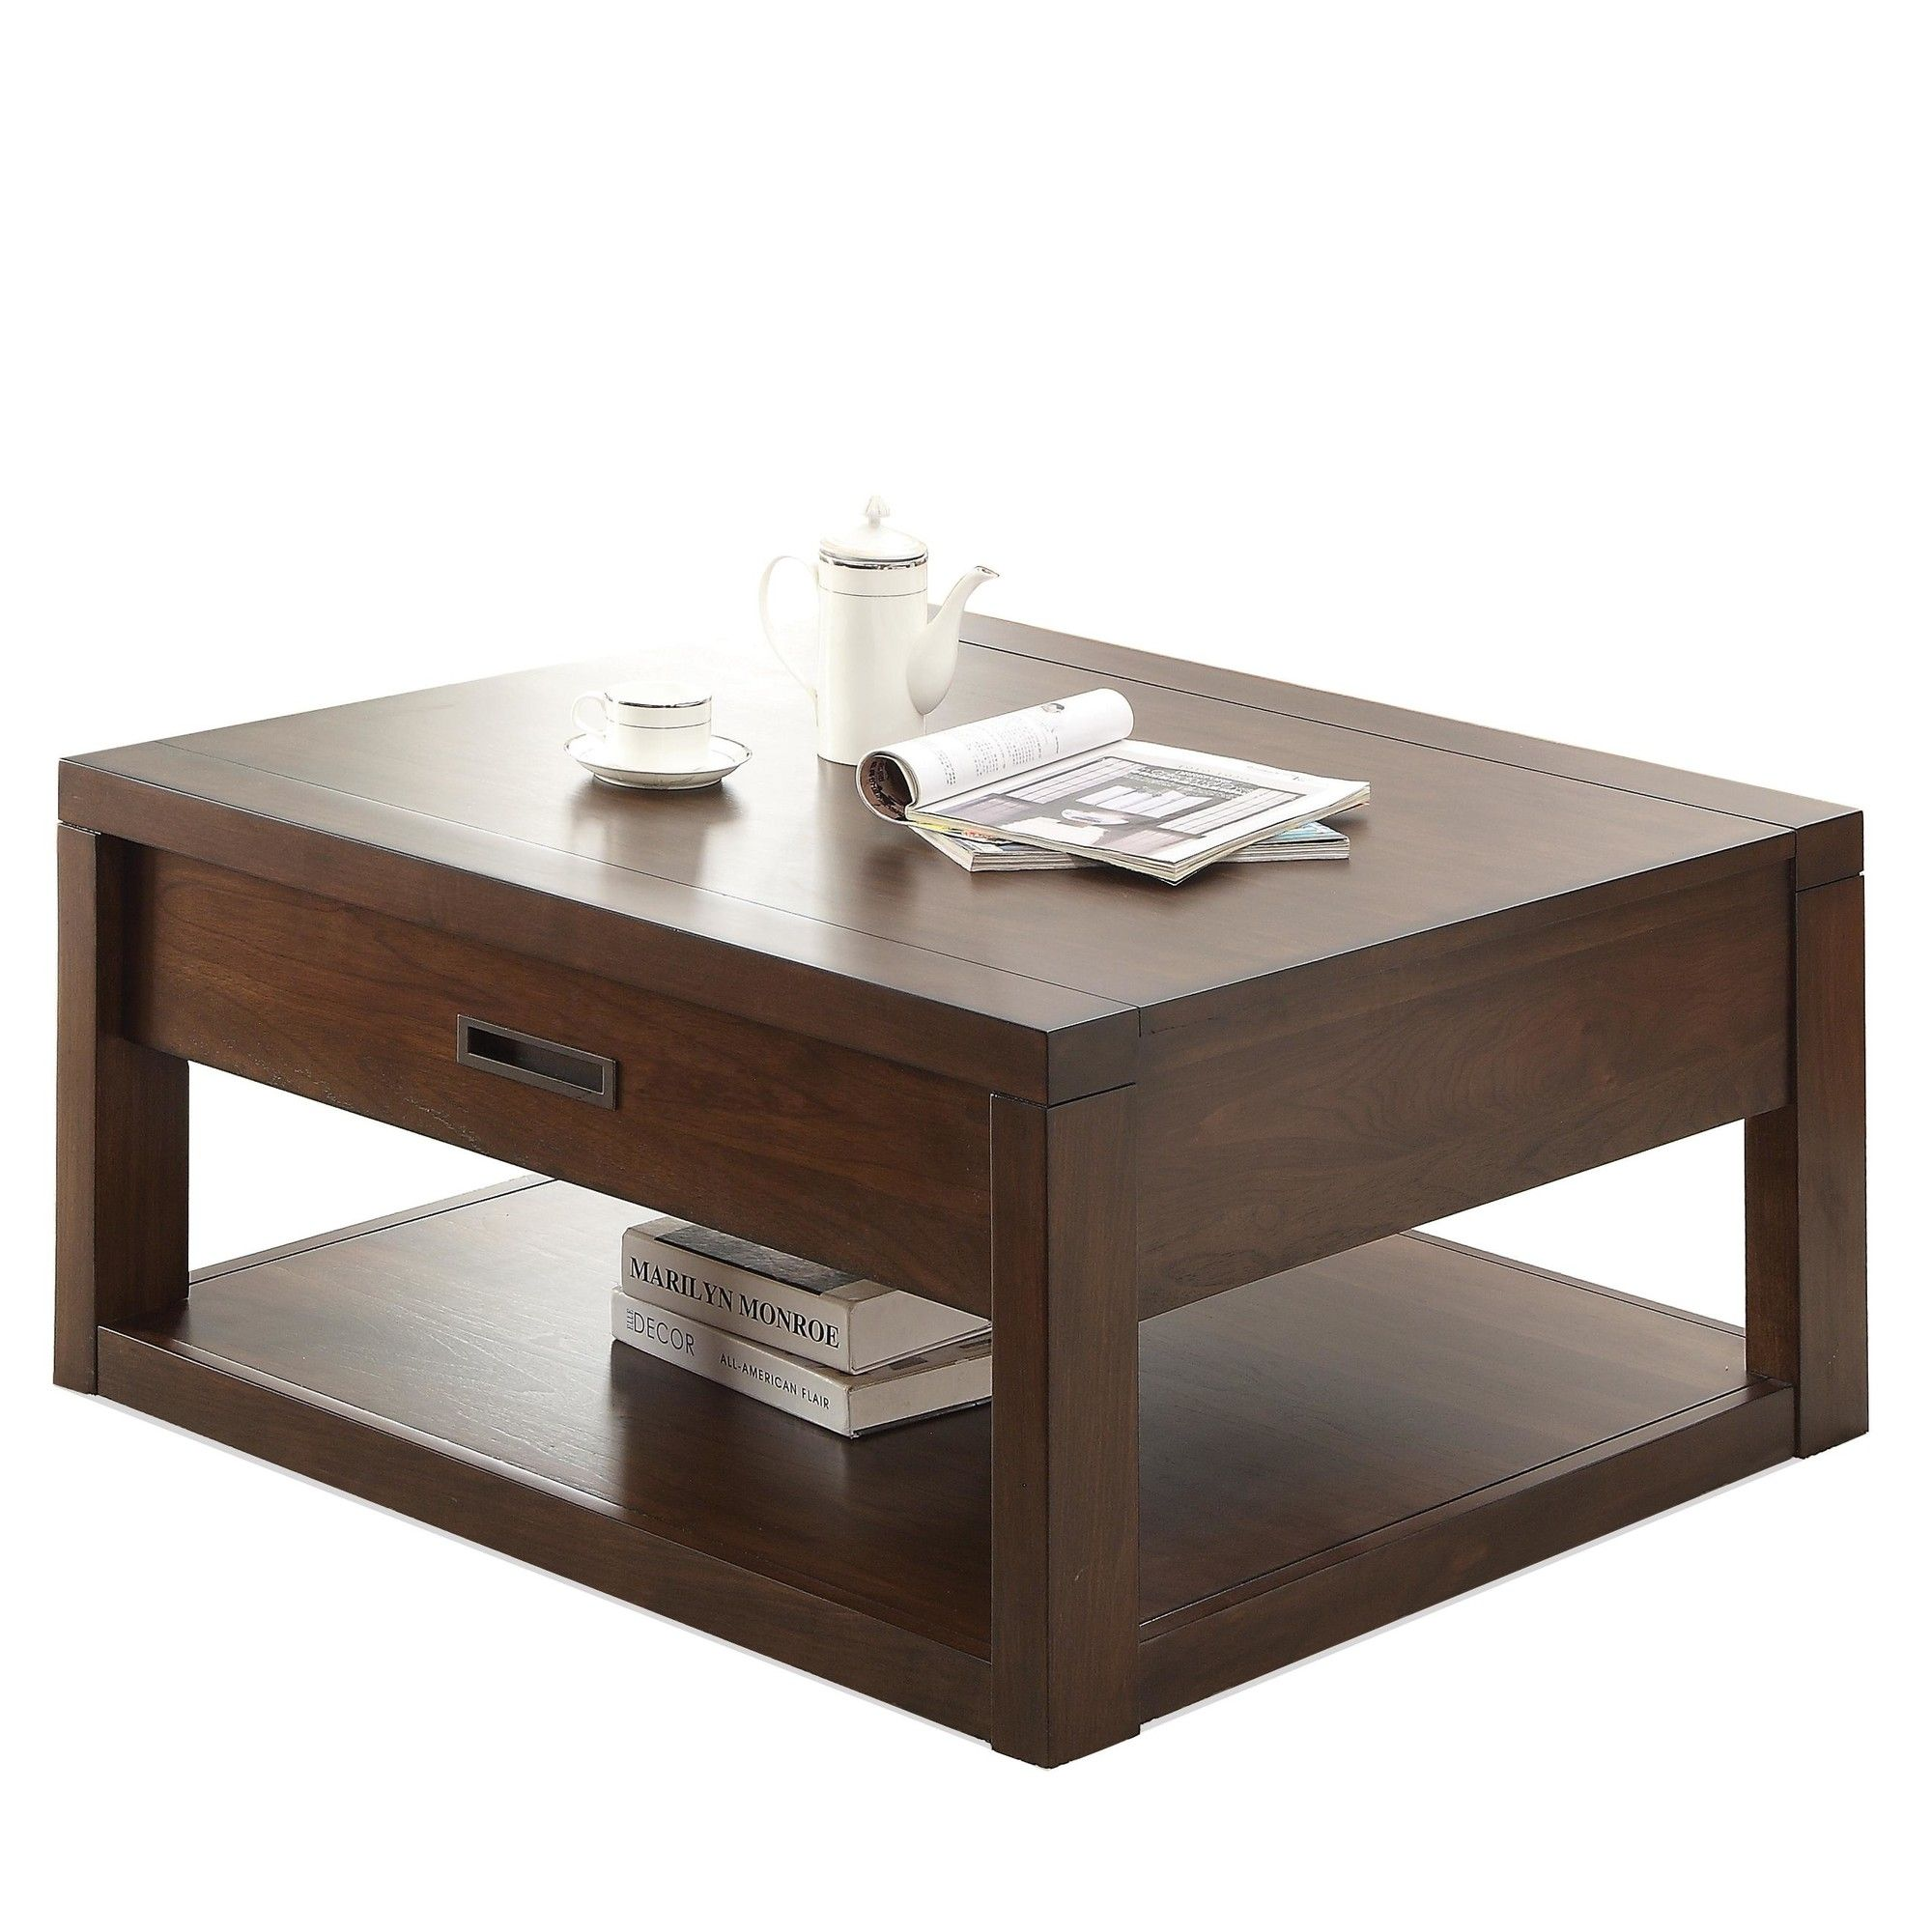 Riverside Furniture Riata Coffee Table & Reviews | Wayfair